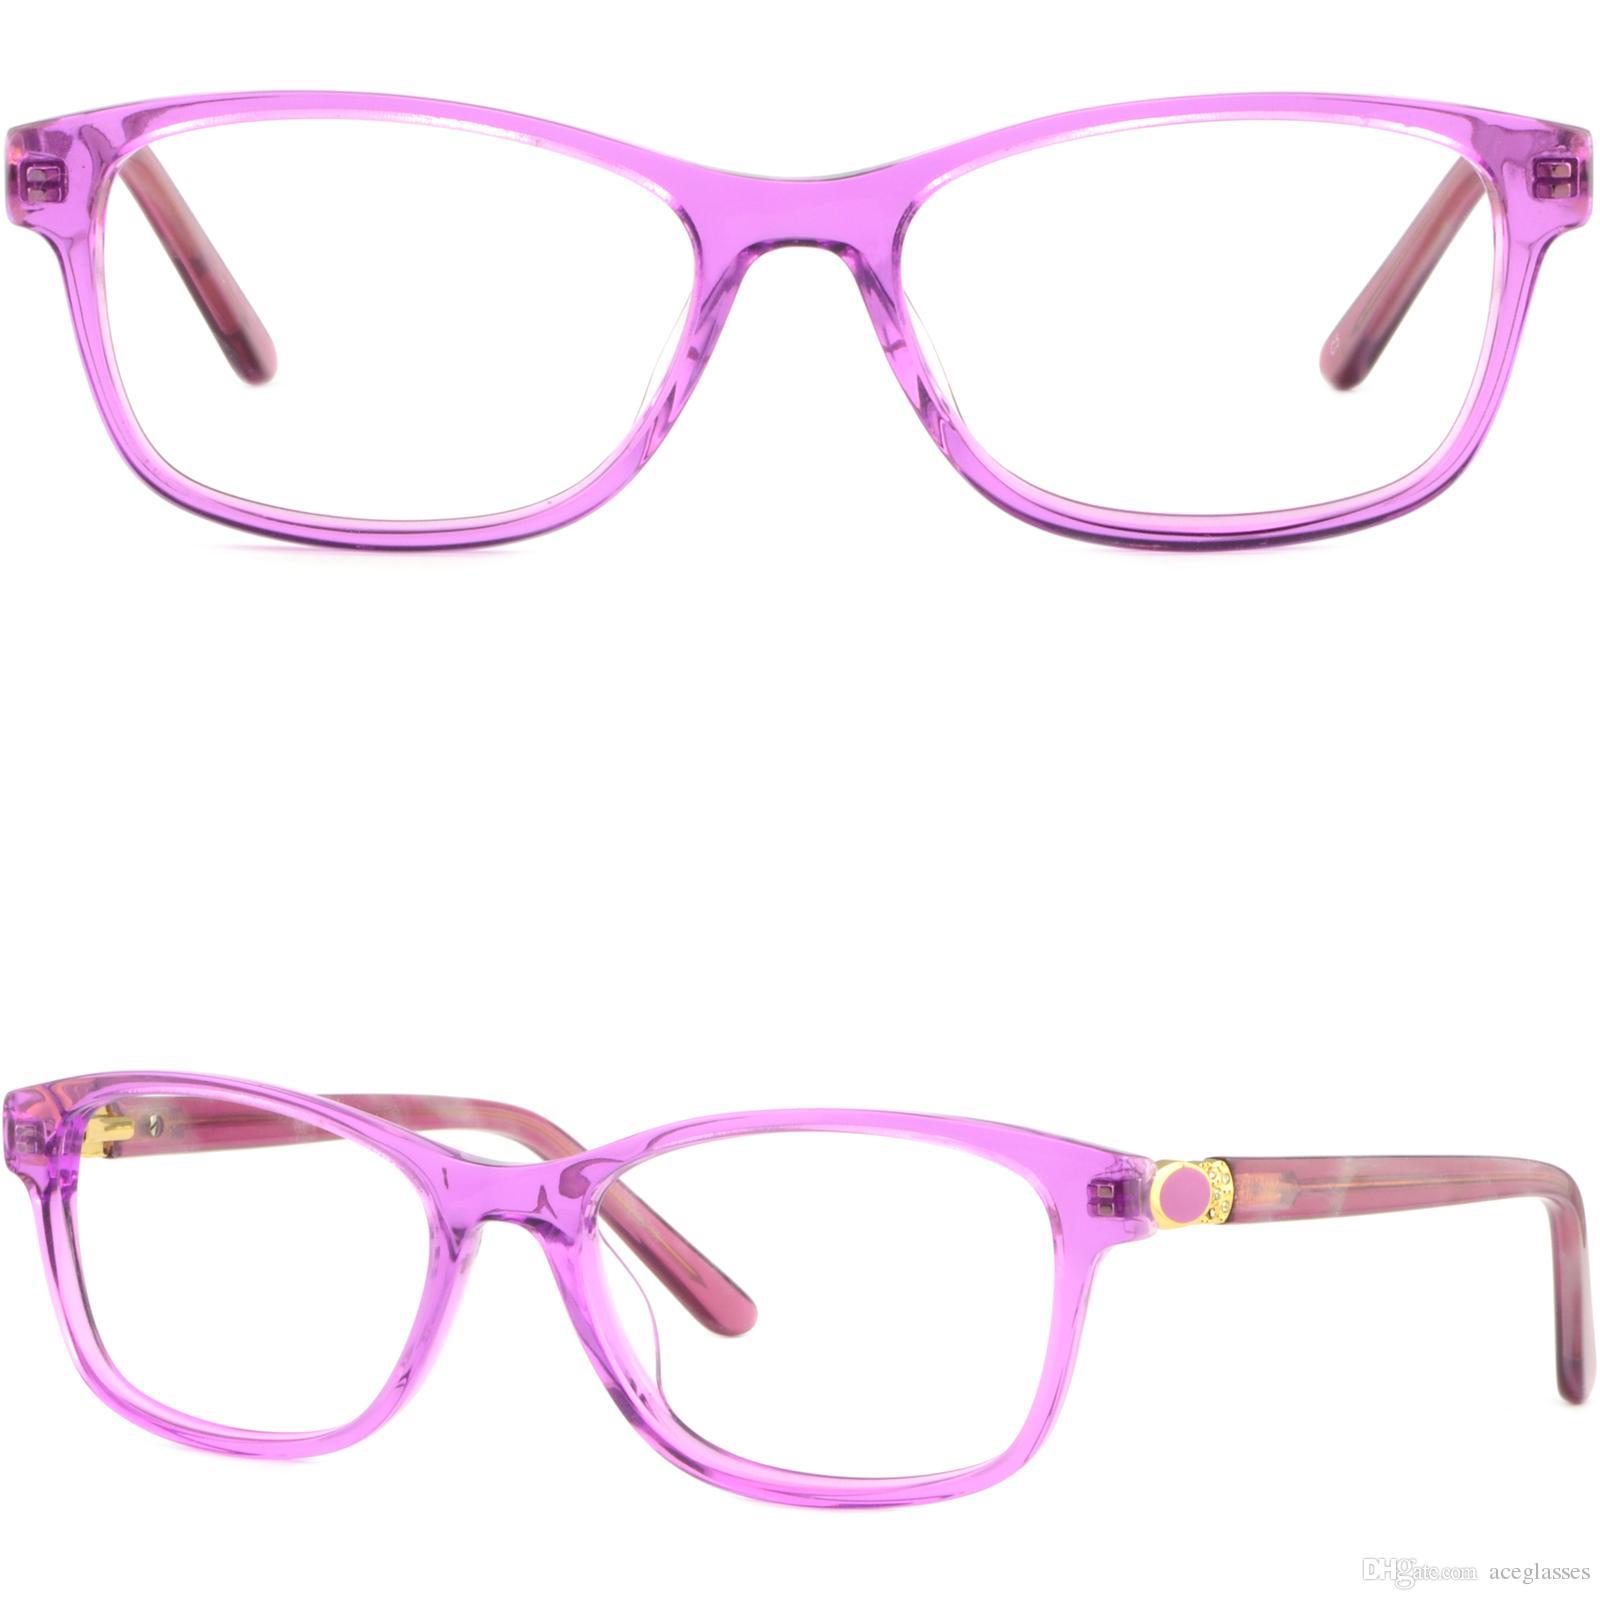 ade5cdc588 Retro Women s Acetate Frames Spring Hinges Prescription Glasses ...